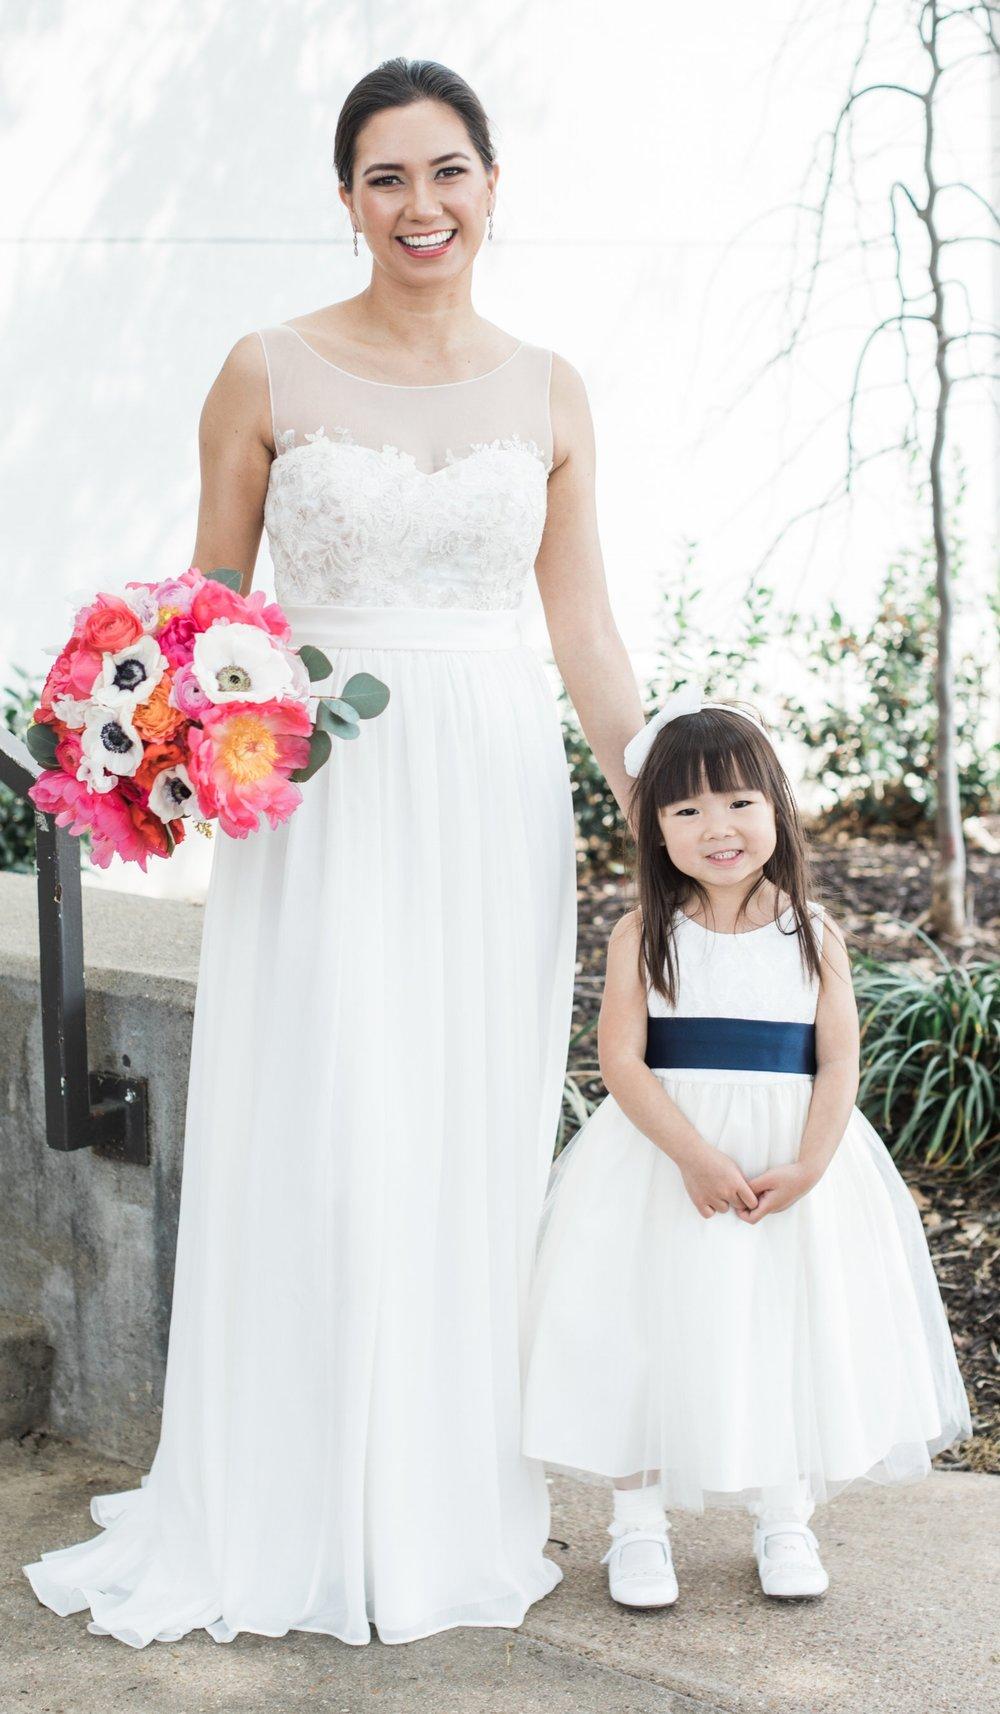 lori_adam_wedding-95.JPG